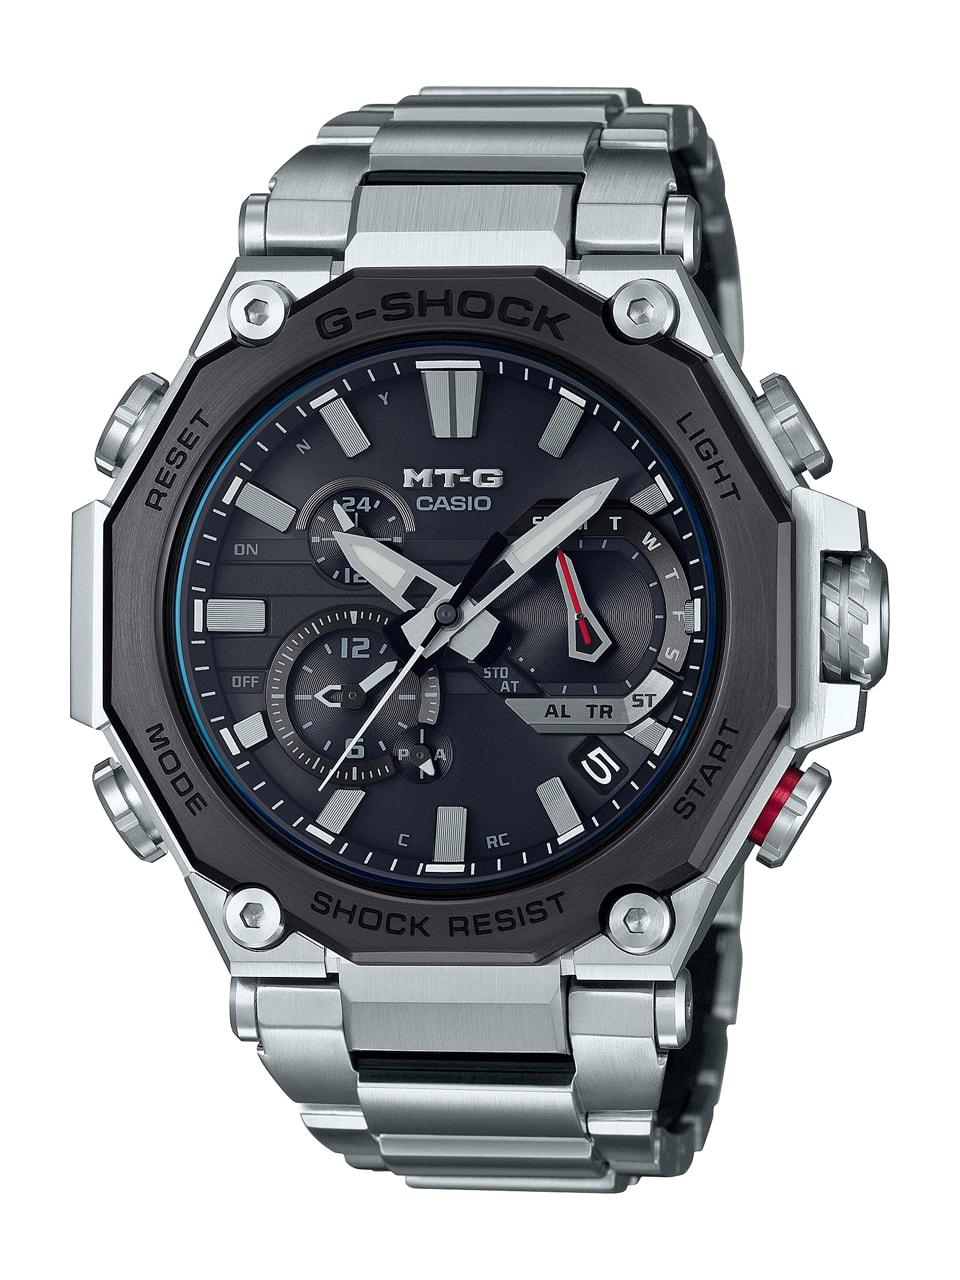 G-Shock MT-G 頂級錶型最新 MT-GB2000 系列發佈